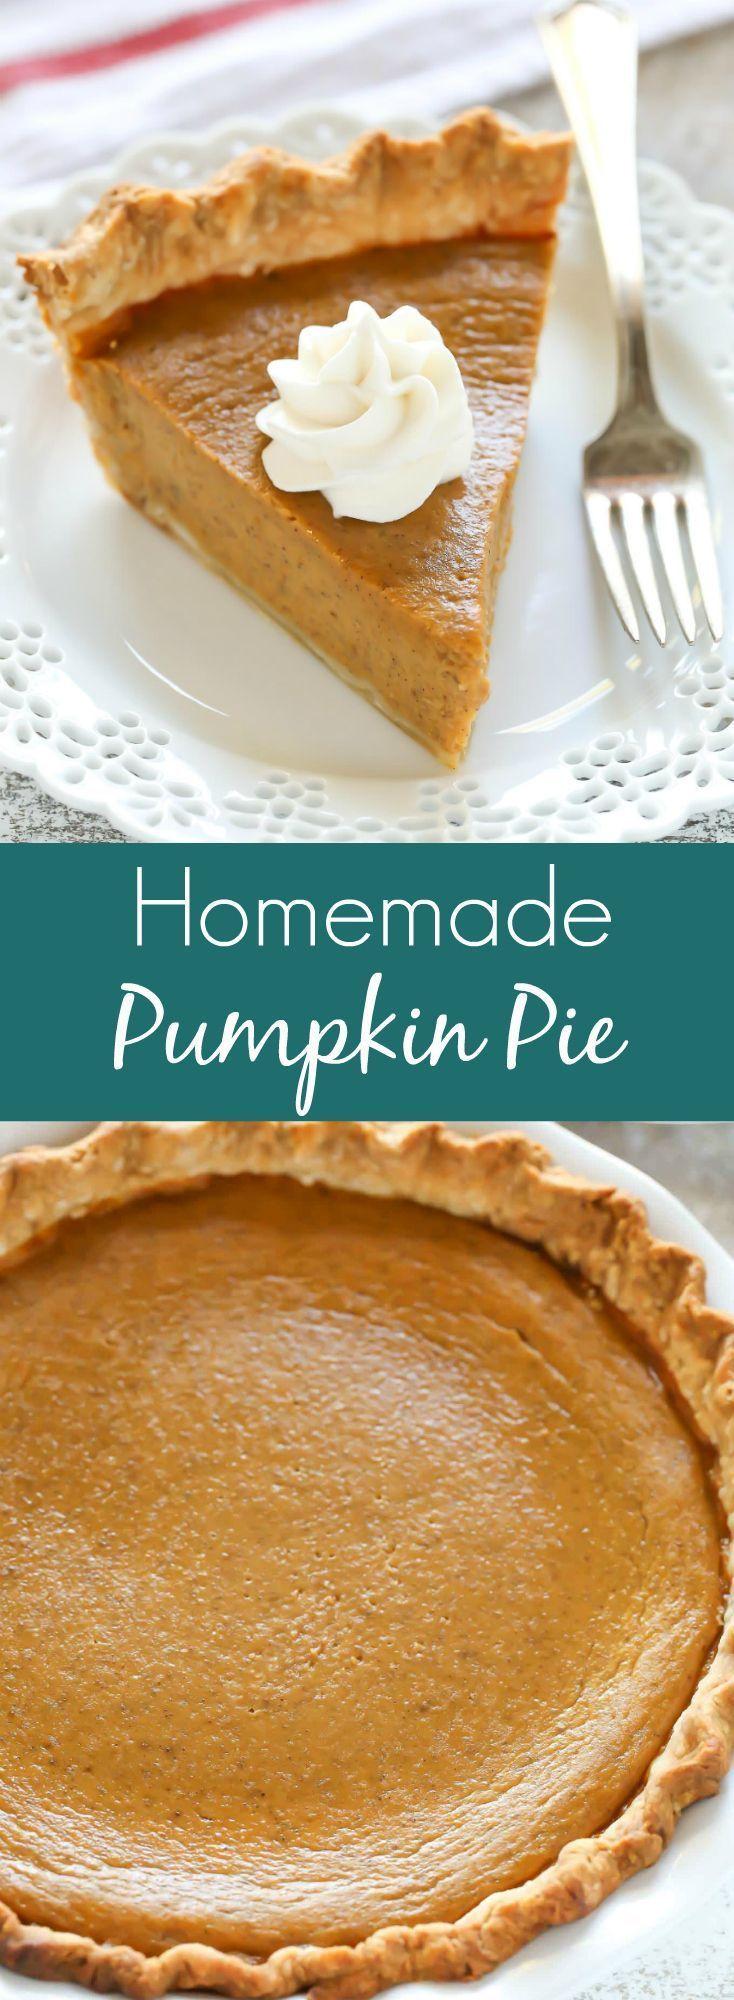 Homemade Pumpkin Pie Homemade Pumpkin Pie